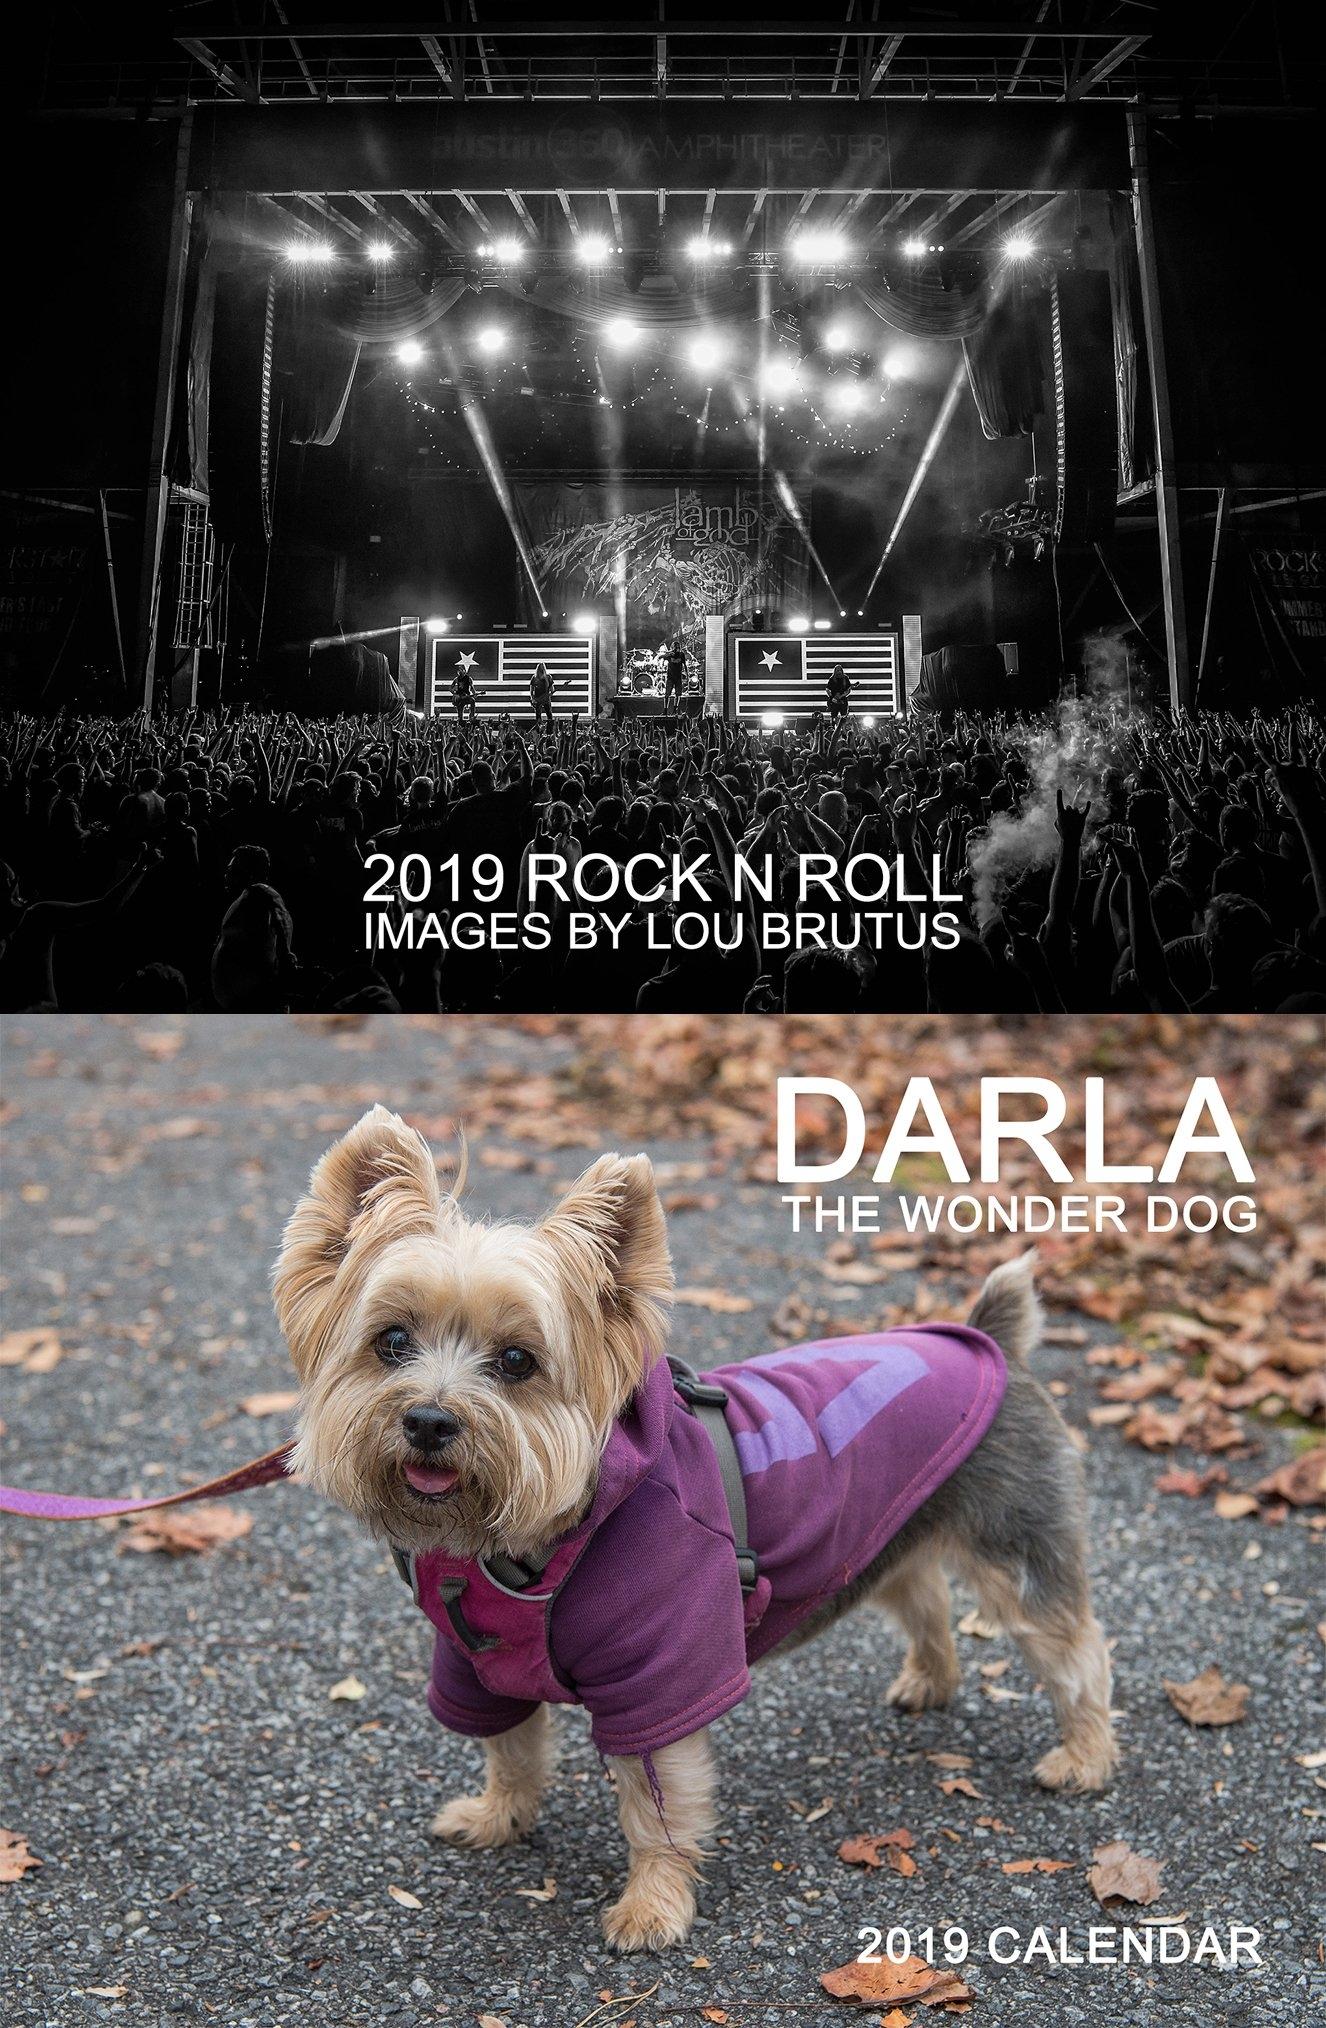 2019 Calendars From Lb & Darla – Lou Brutus – Sonic Warrior Rock N Roll Calendar 2019